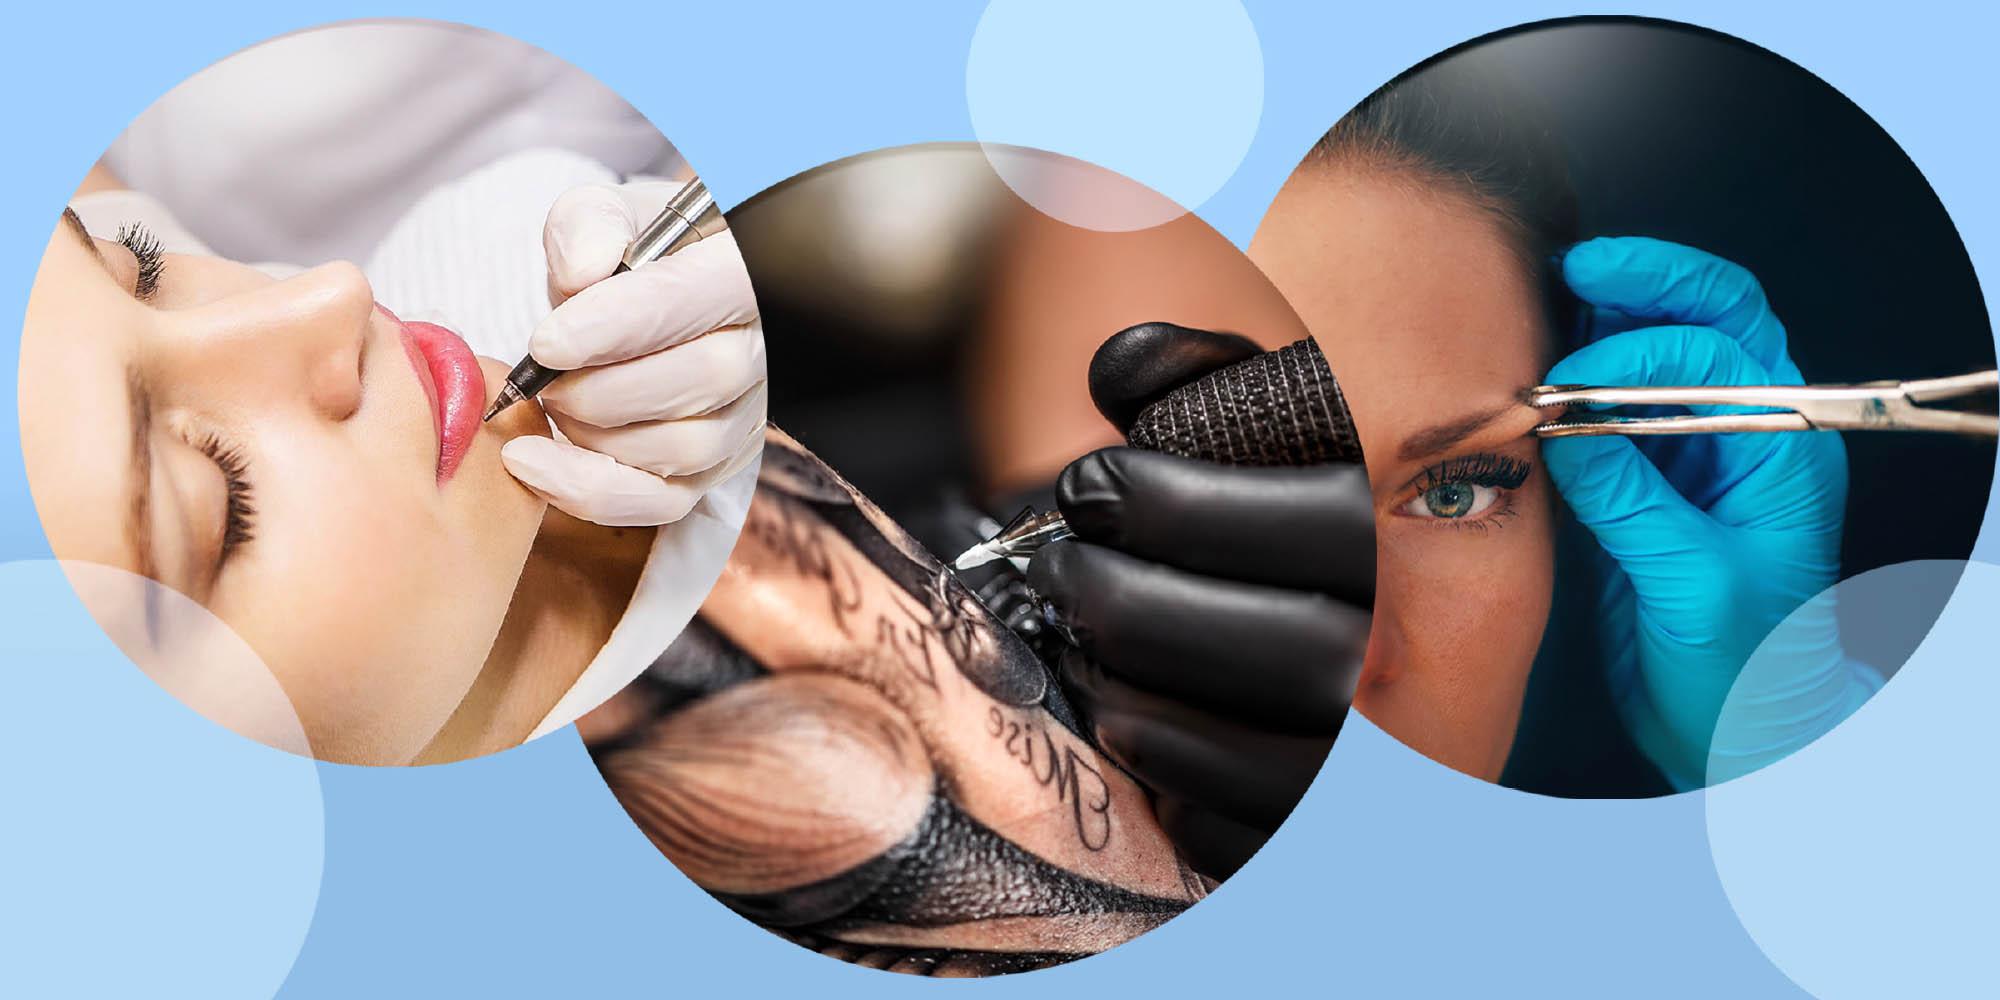 tattoo_riconosciuti_01.jpg